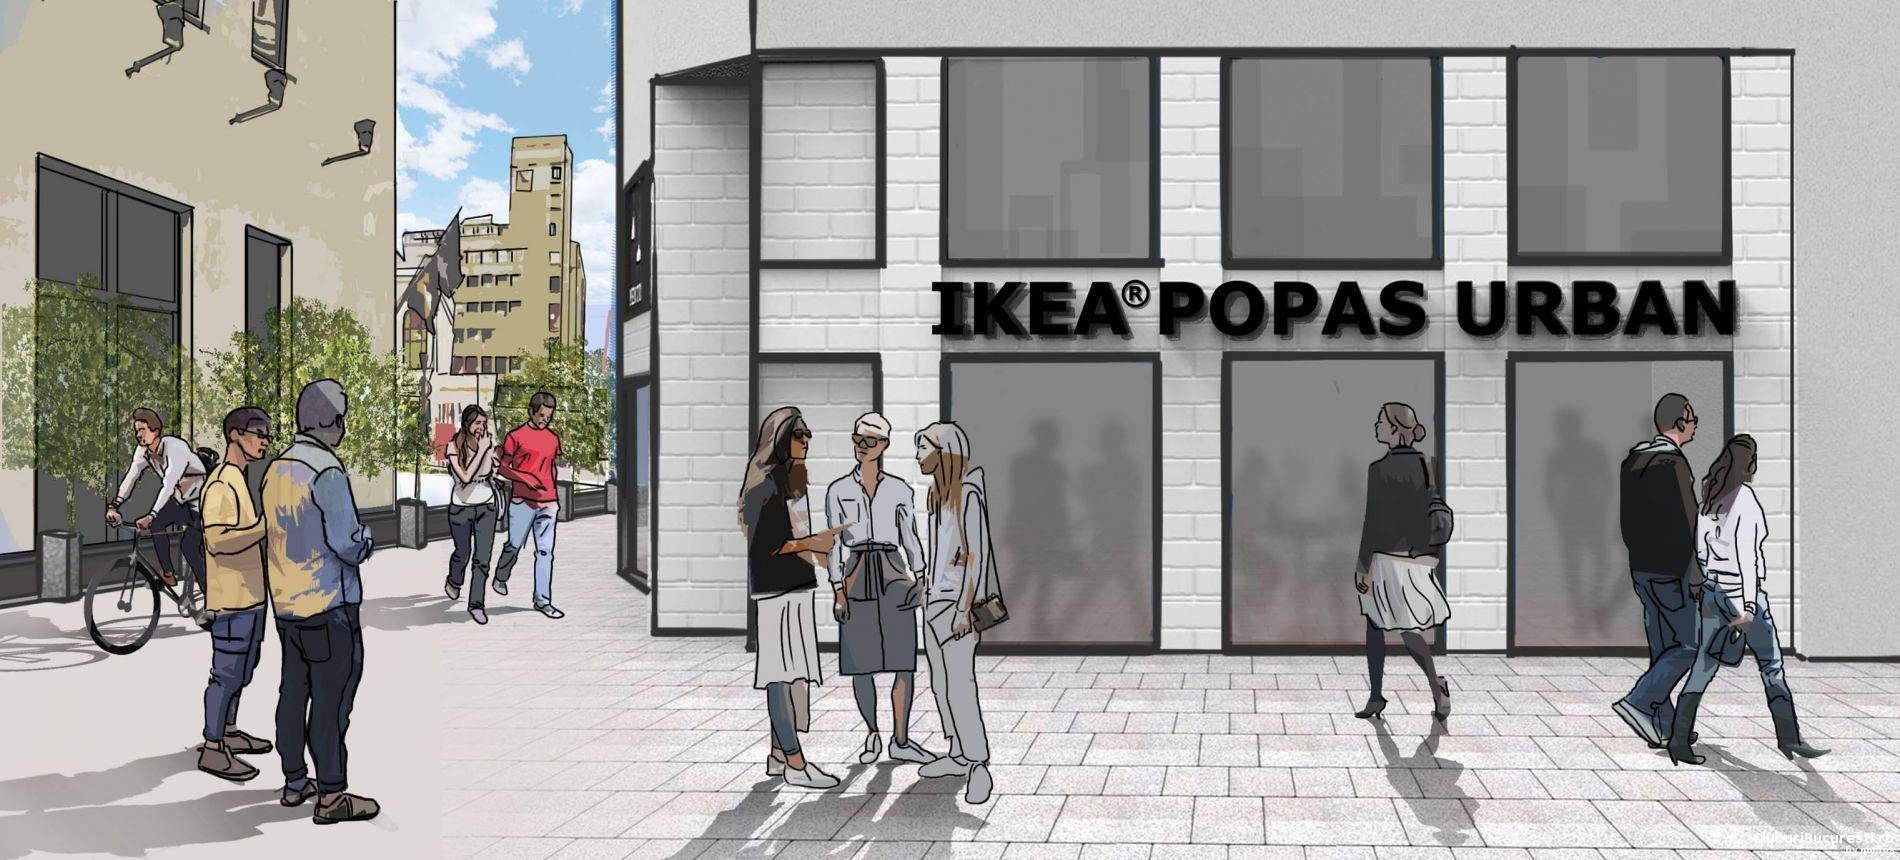 IKEA Popas Urban